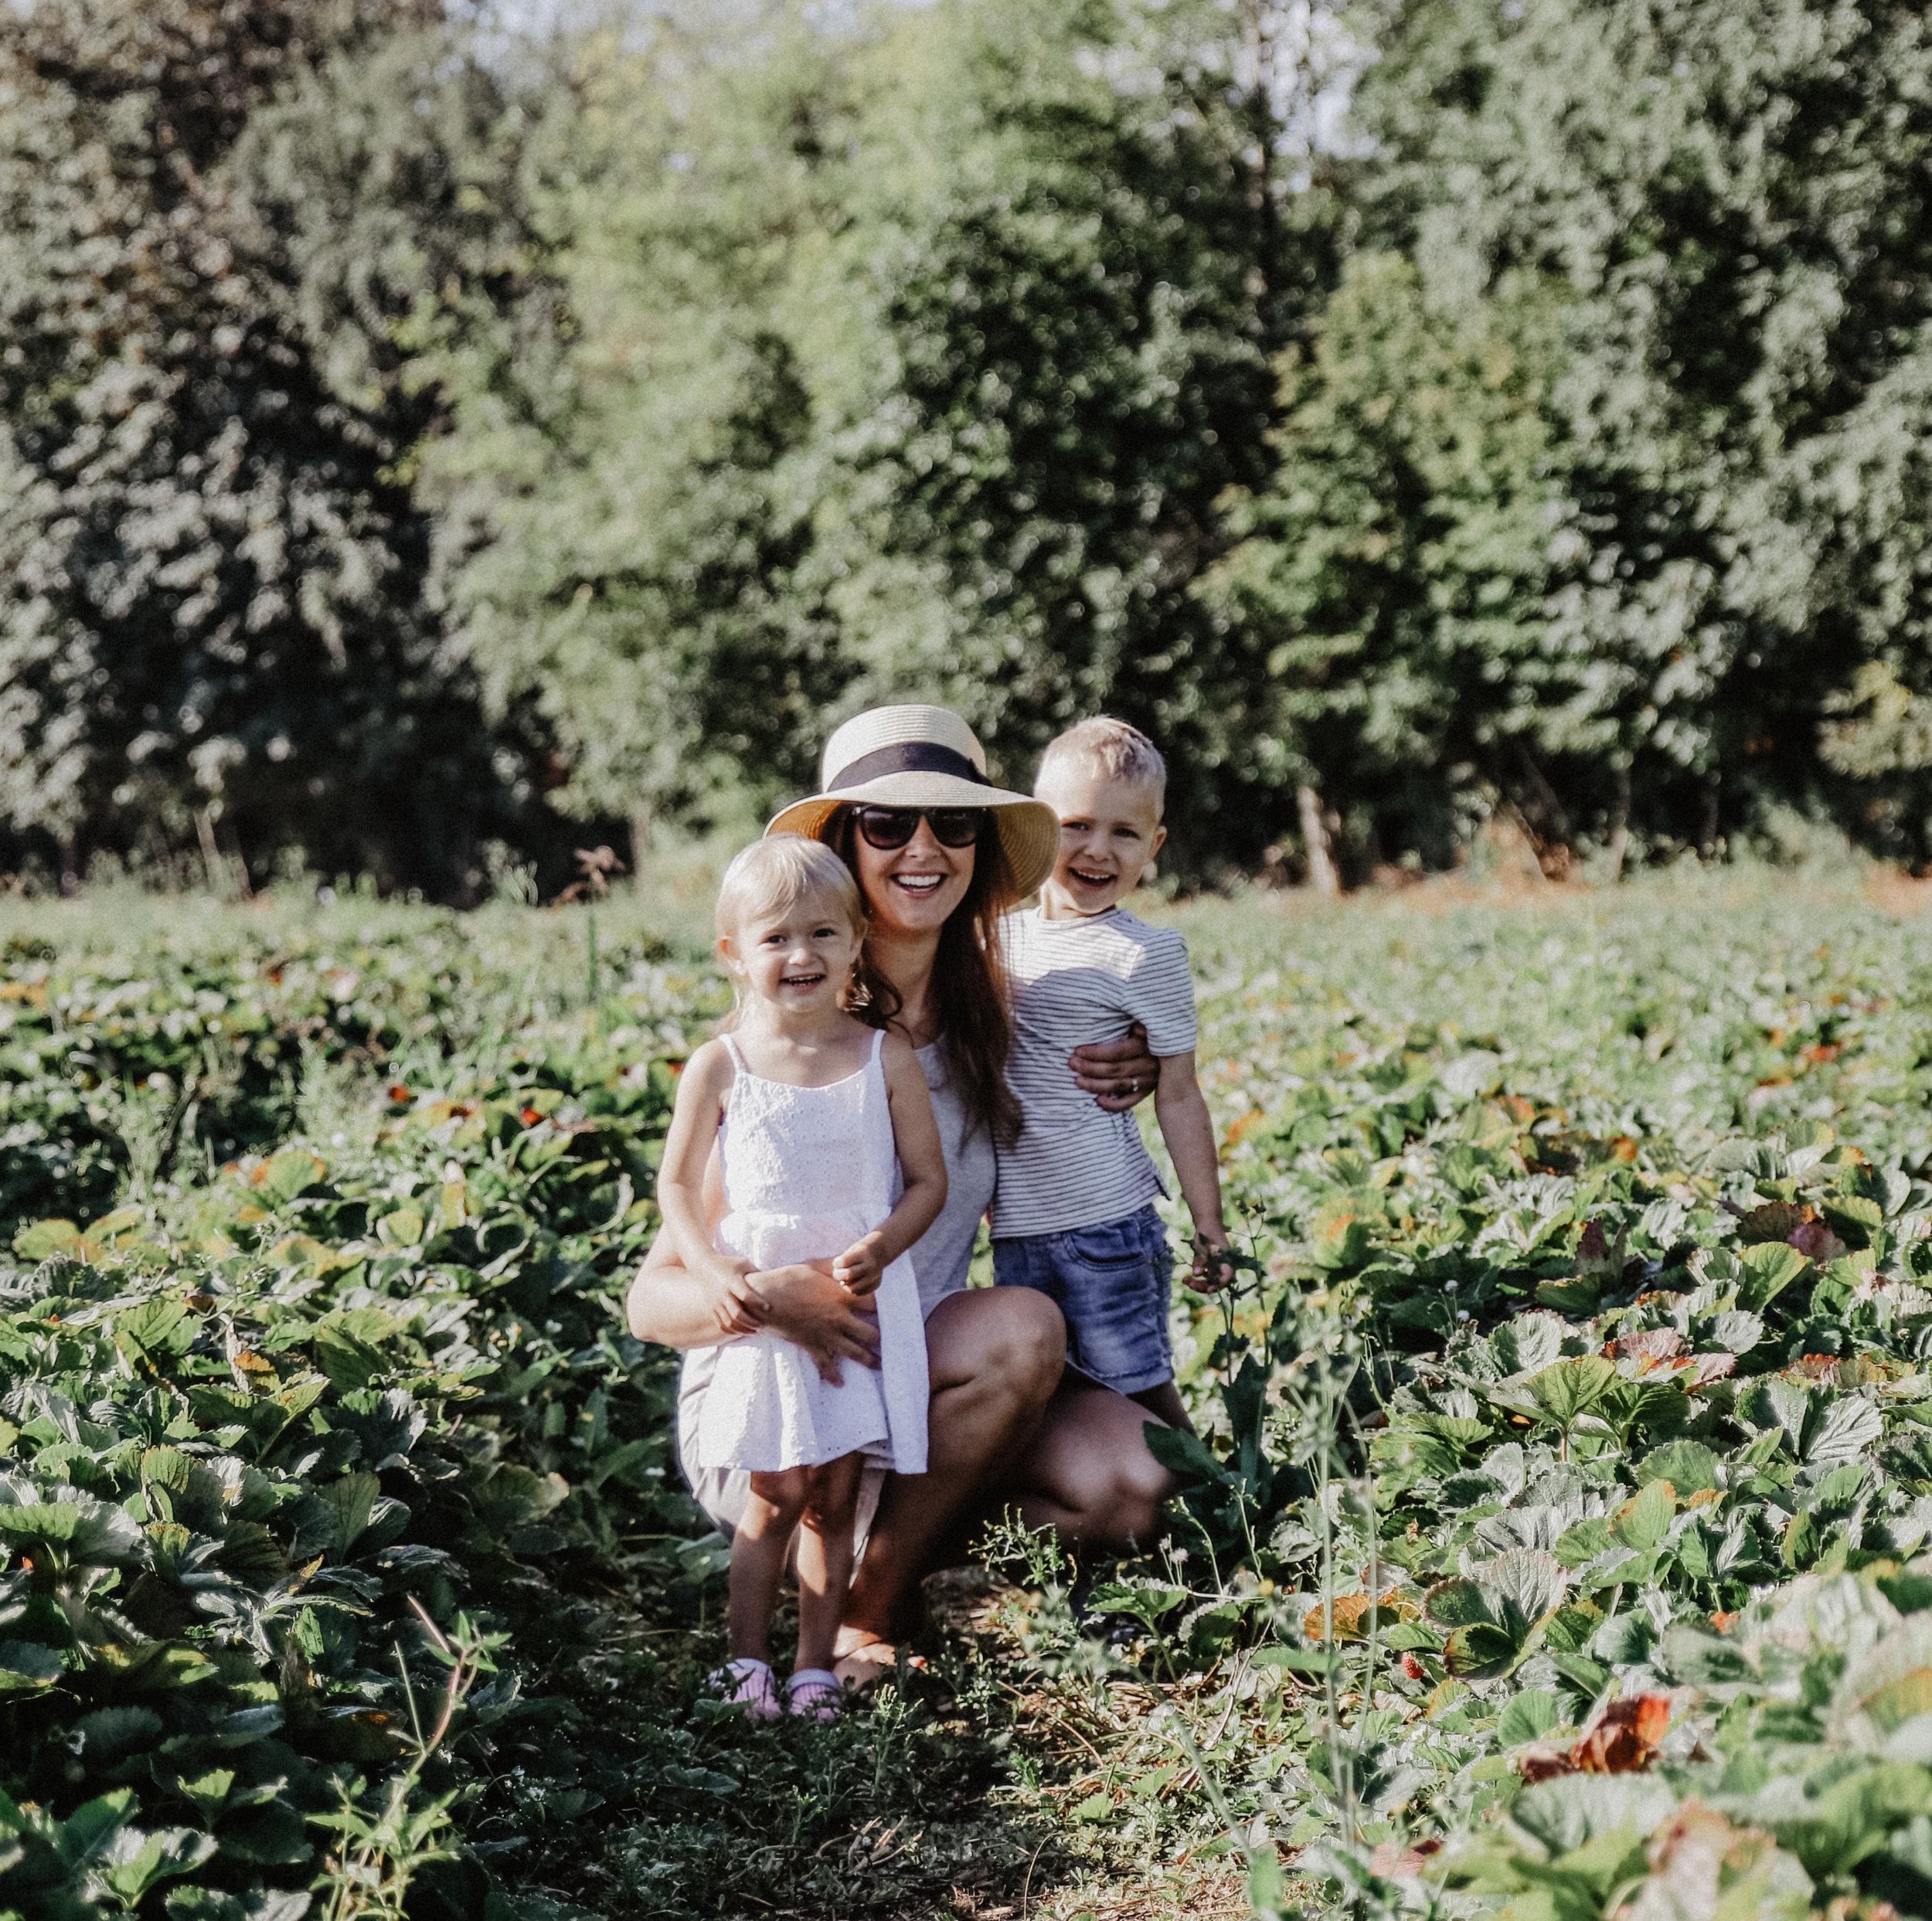 Driediger farms-8.jpg